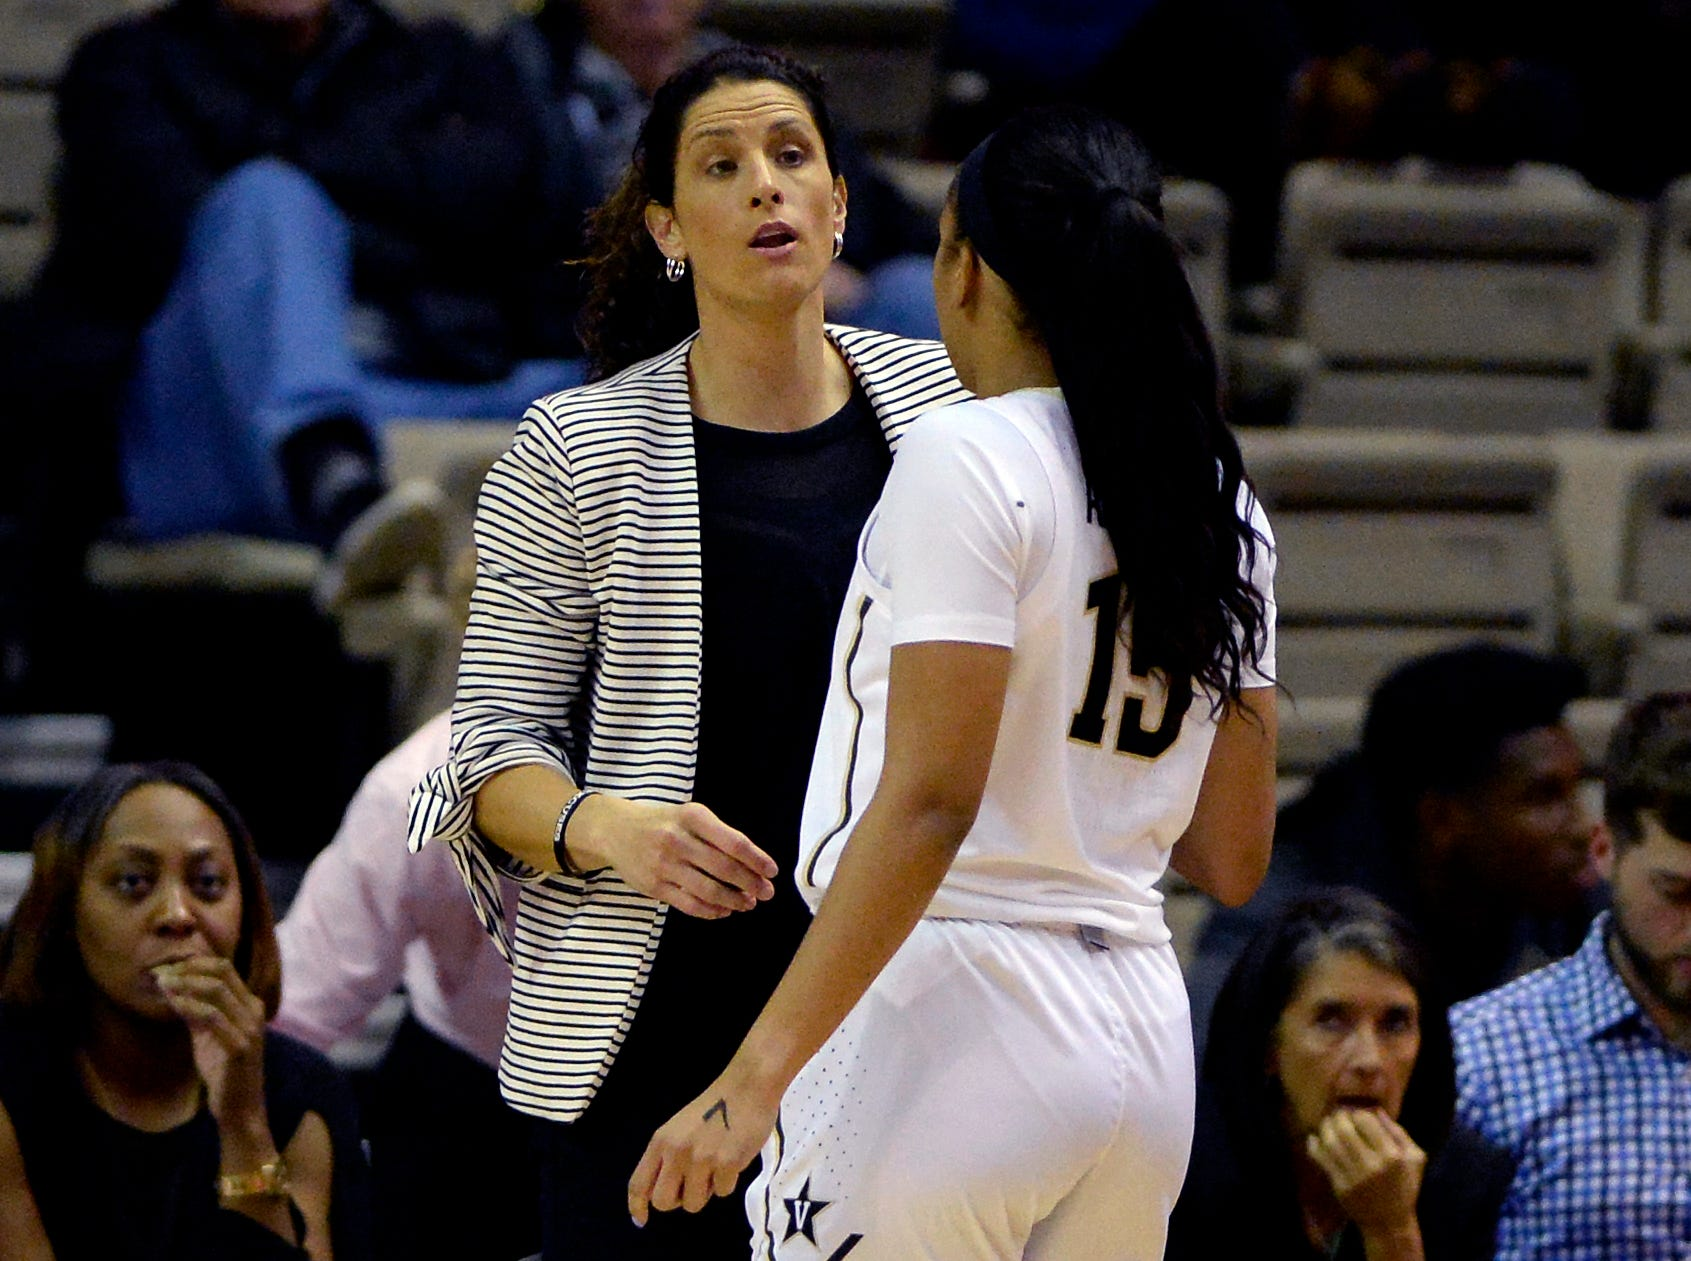 Vanderbilt head coach Stephanie White talks with forward Brinae Alexander (15) during the first half of an NCAA college basketball game against Austin Peay Monday, Nov. 12, 2018, in Nashville, Tenn.